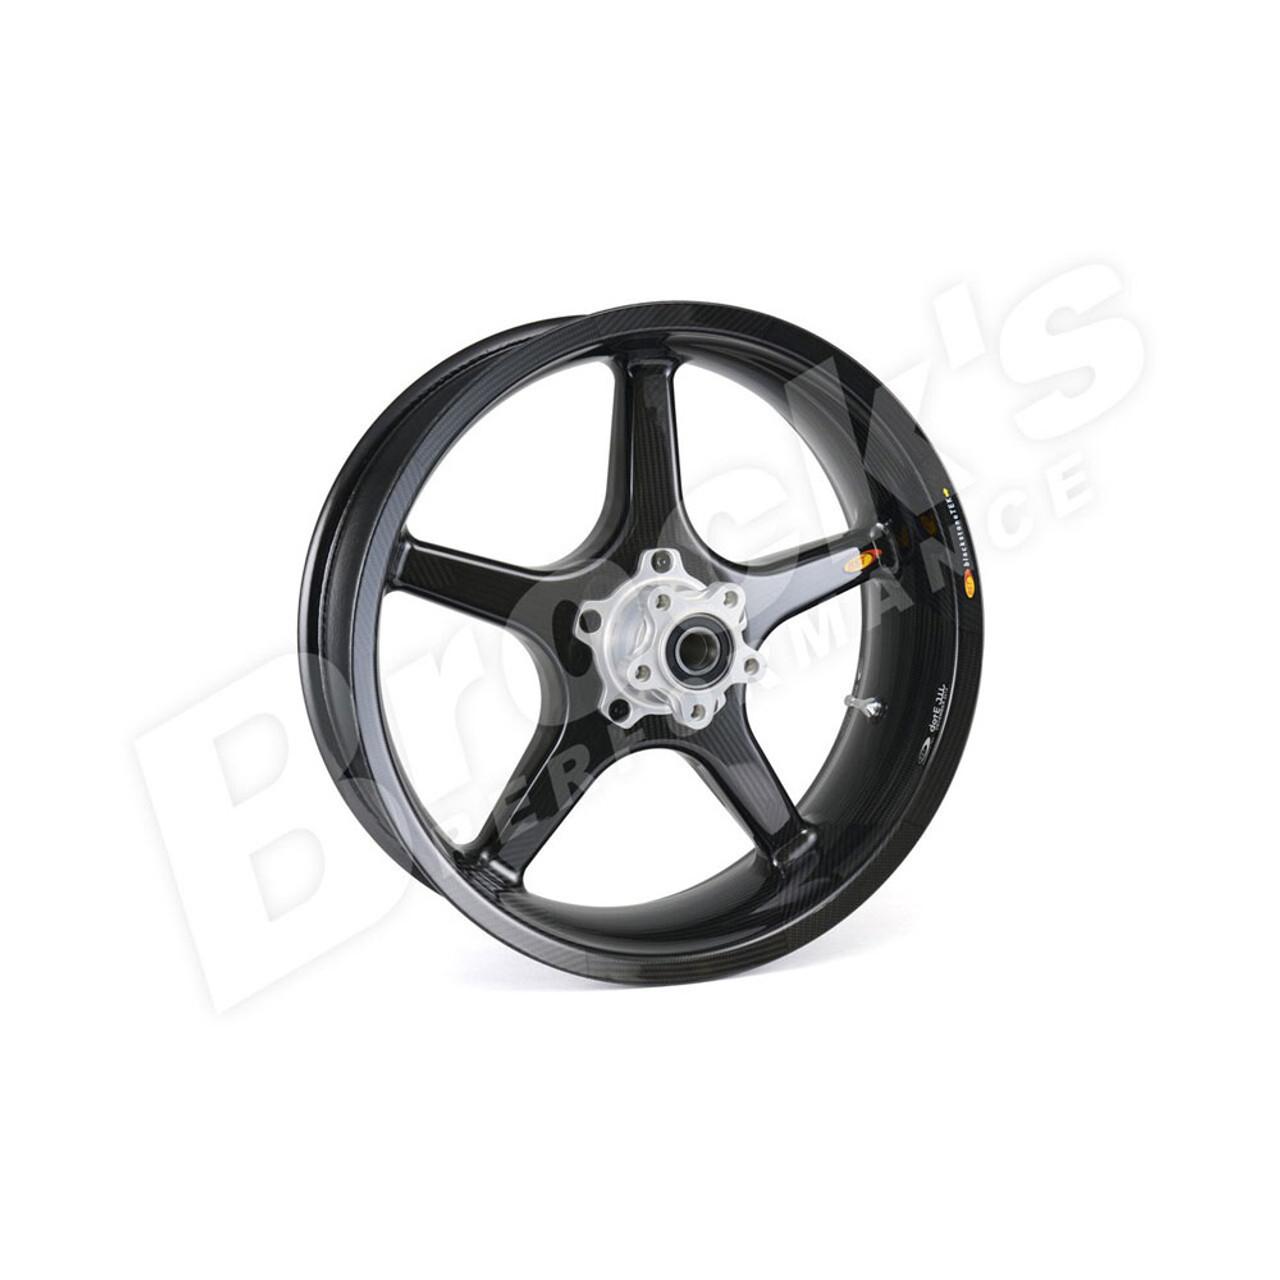 Carbon Fiber Wheels >> Bst 17 X 4 5 Black Star Carbon Fiber Rear Wheel For 2008 2017